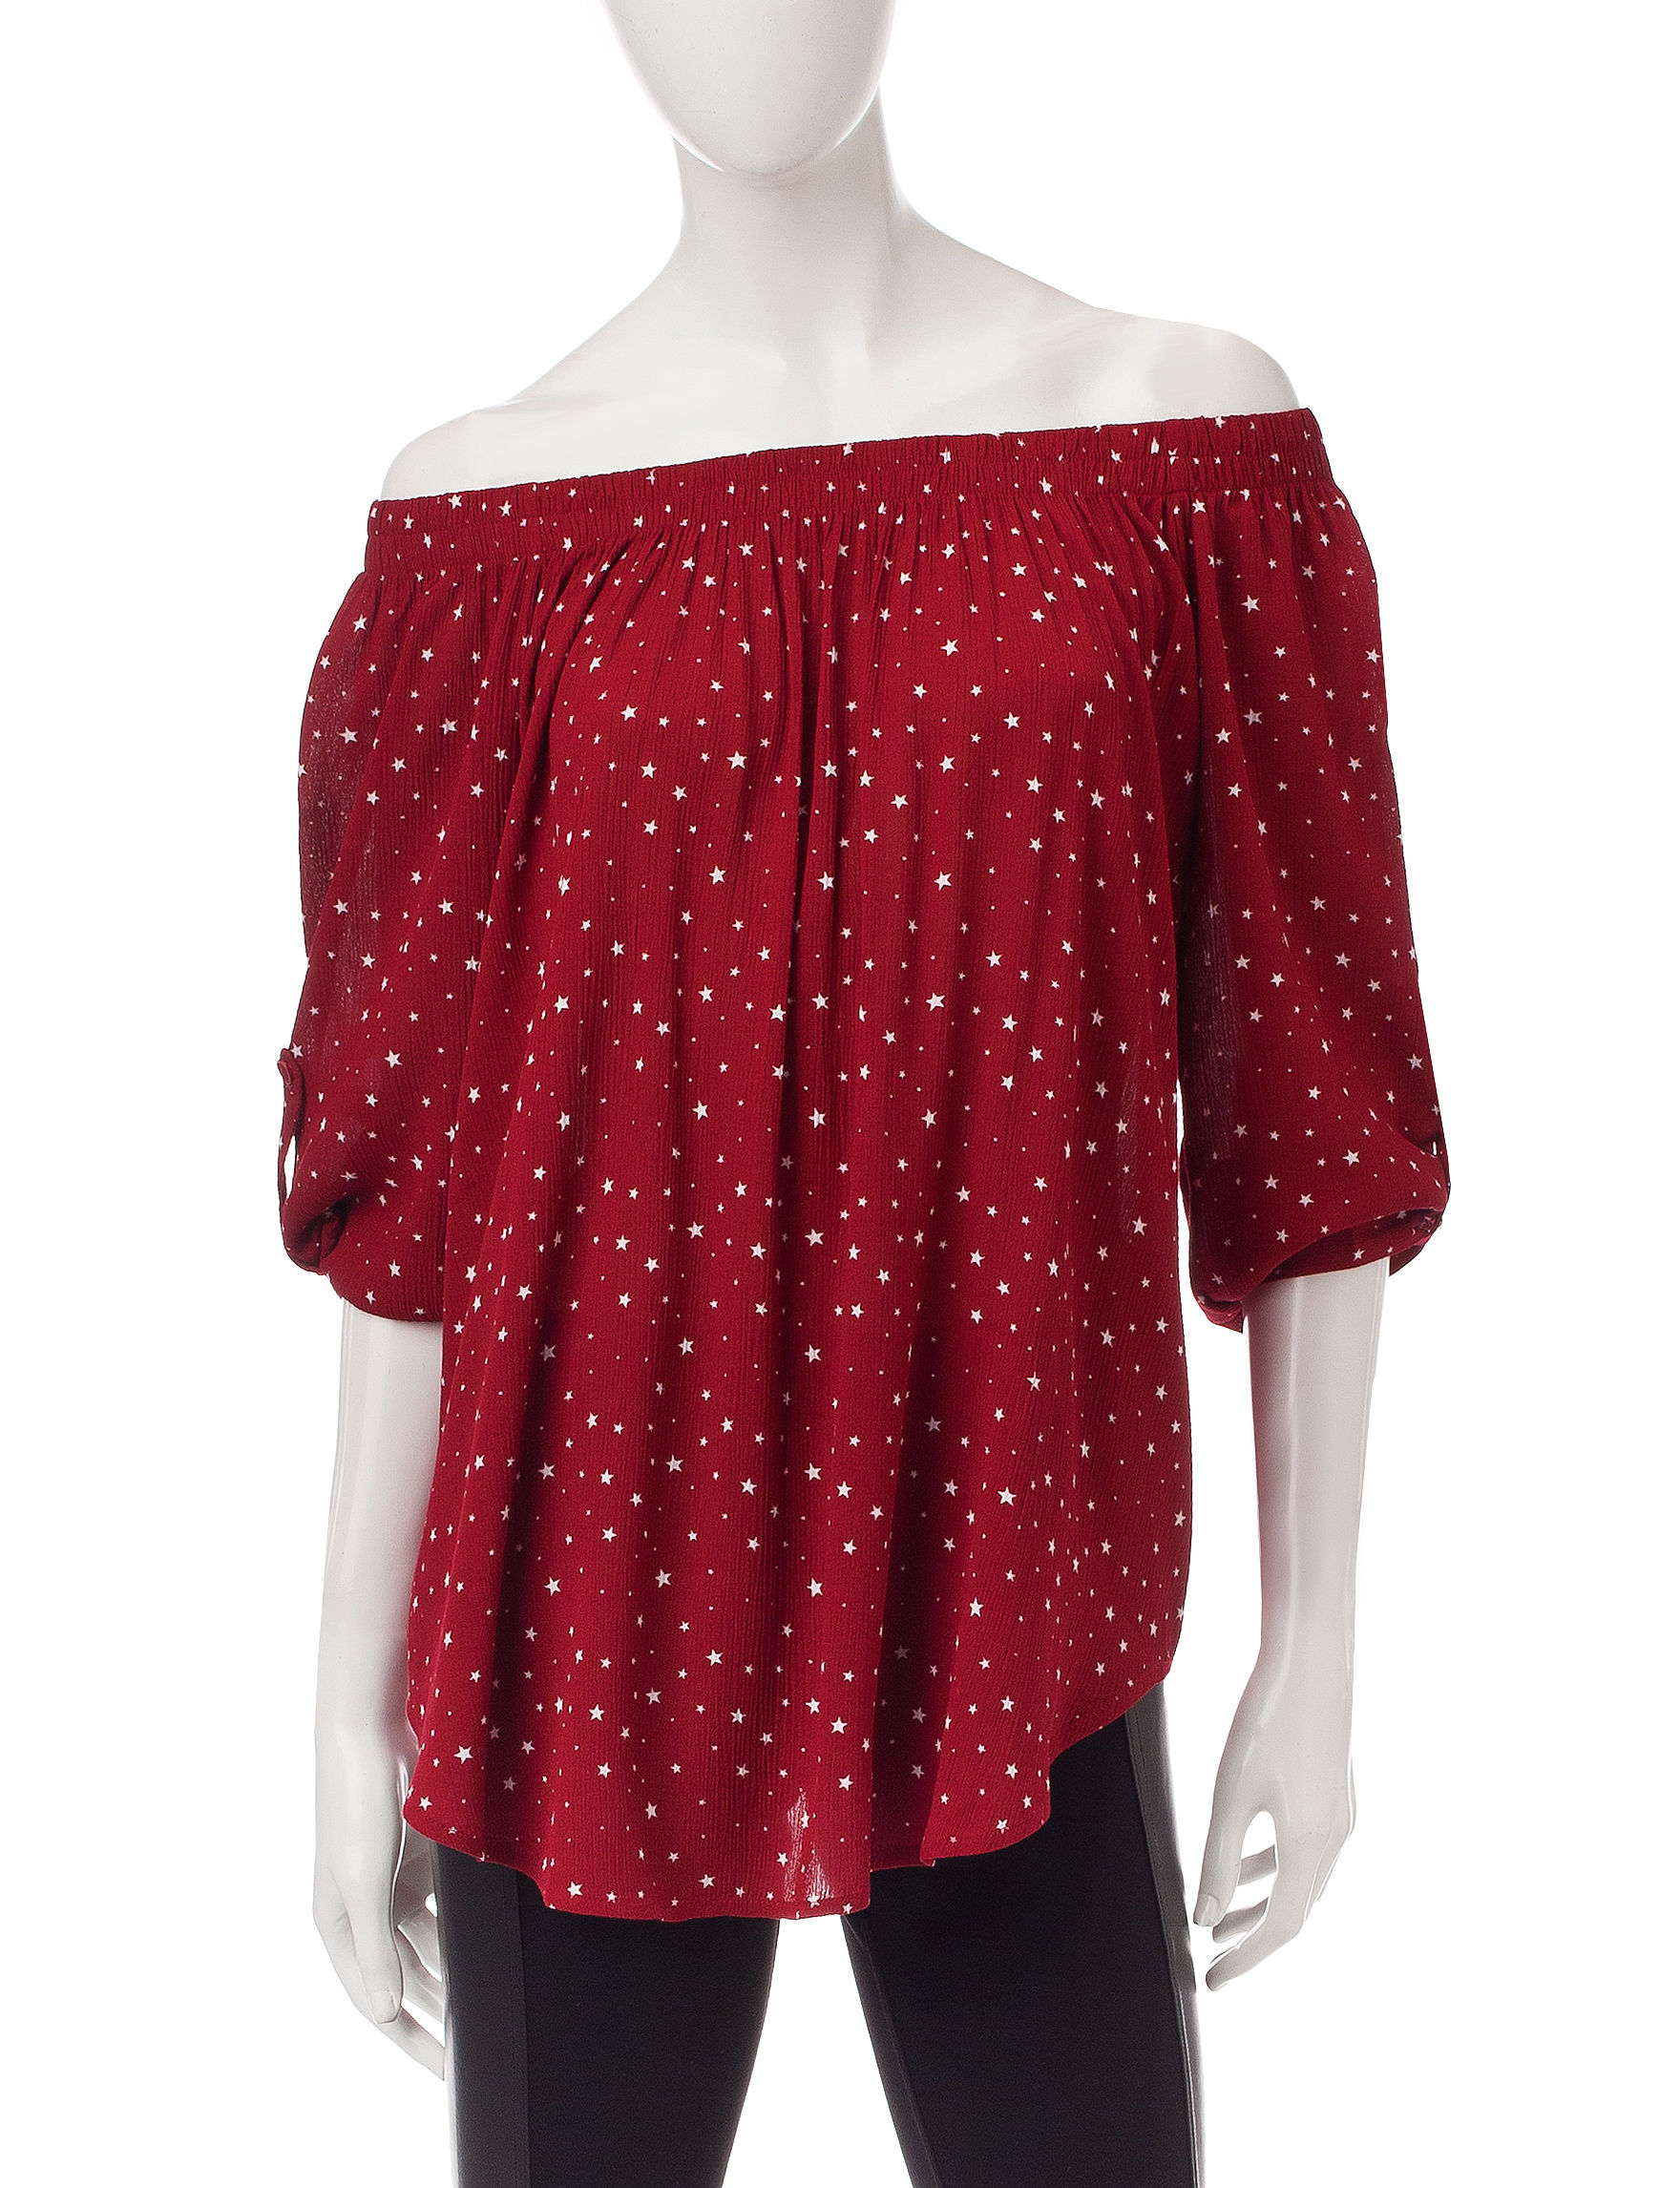 Signature Studio Red Shirts & Blouses